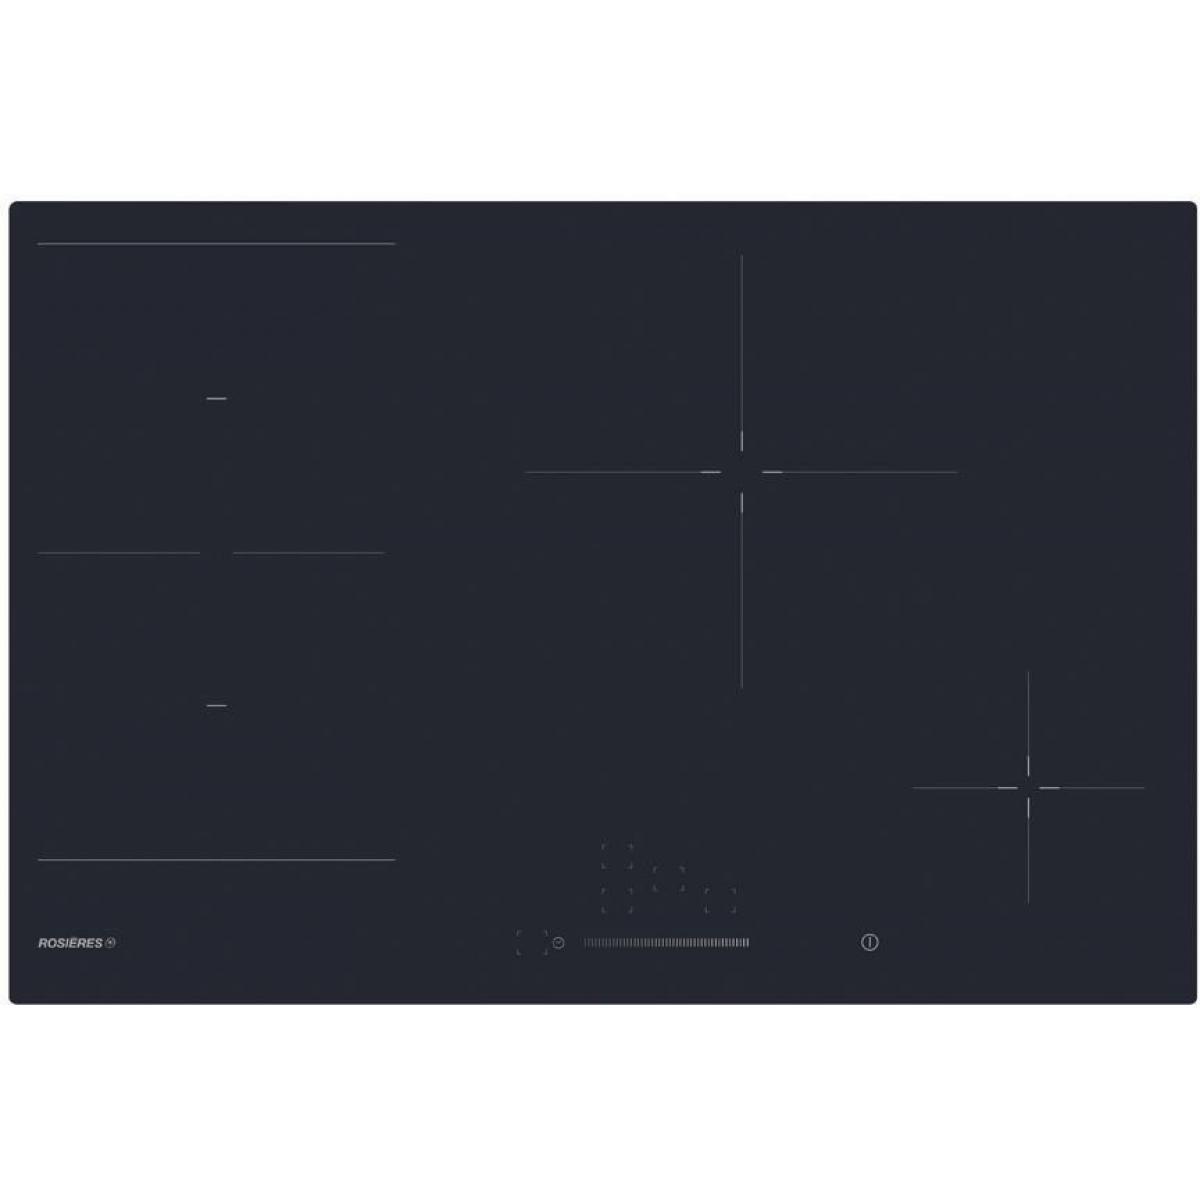 Rosieres Plaque induction ROSIèRES 7400W 77cm, RIES 844 SC